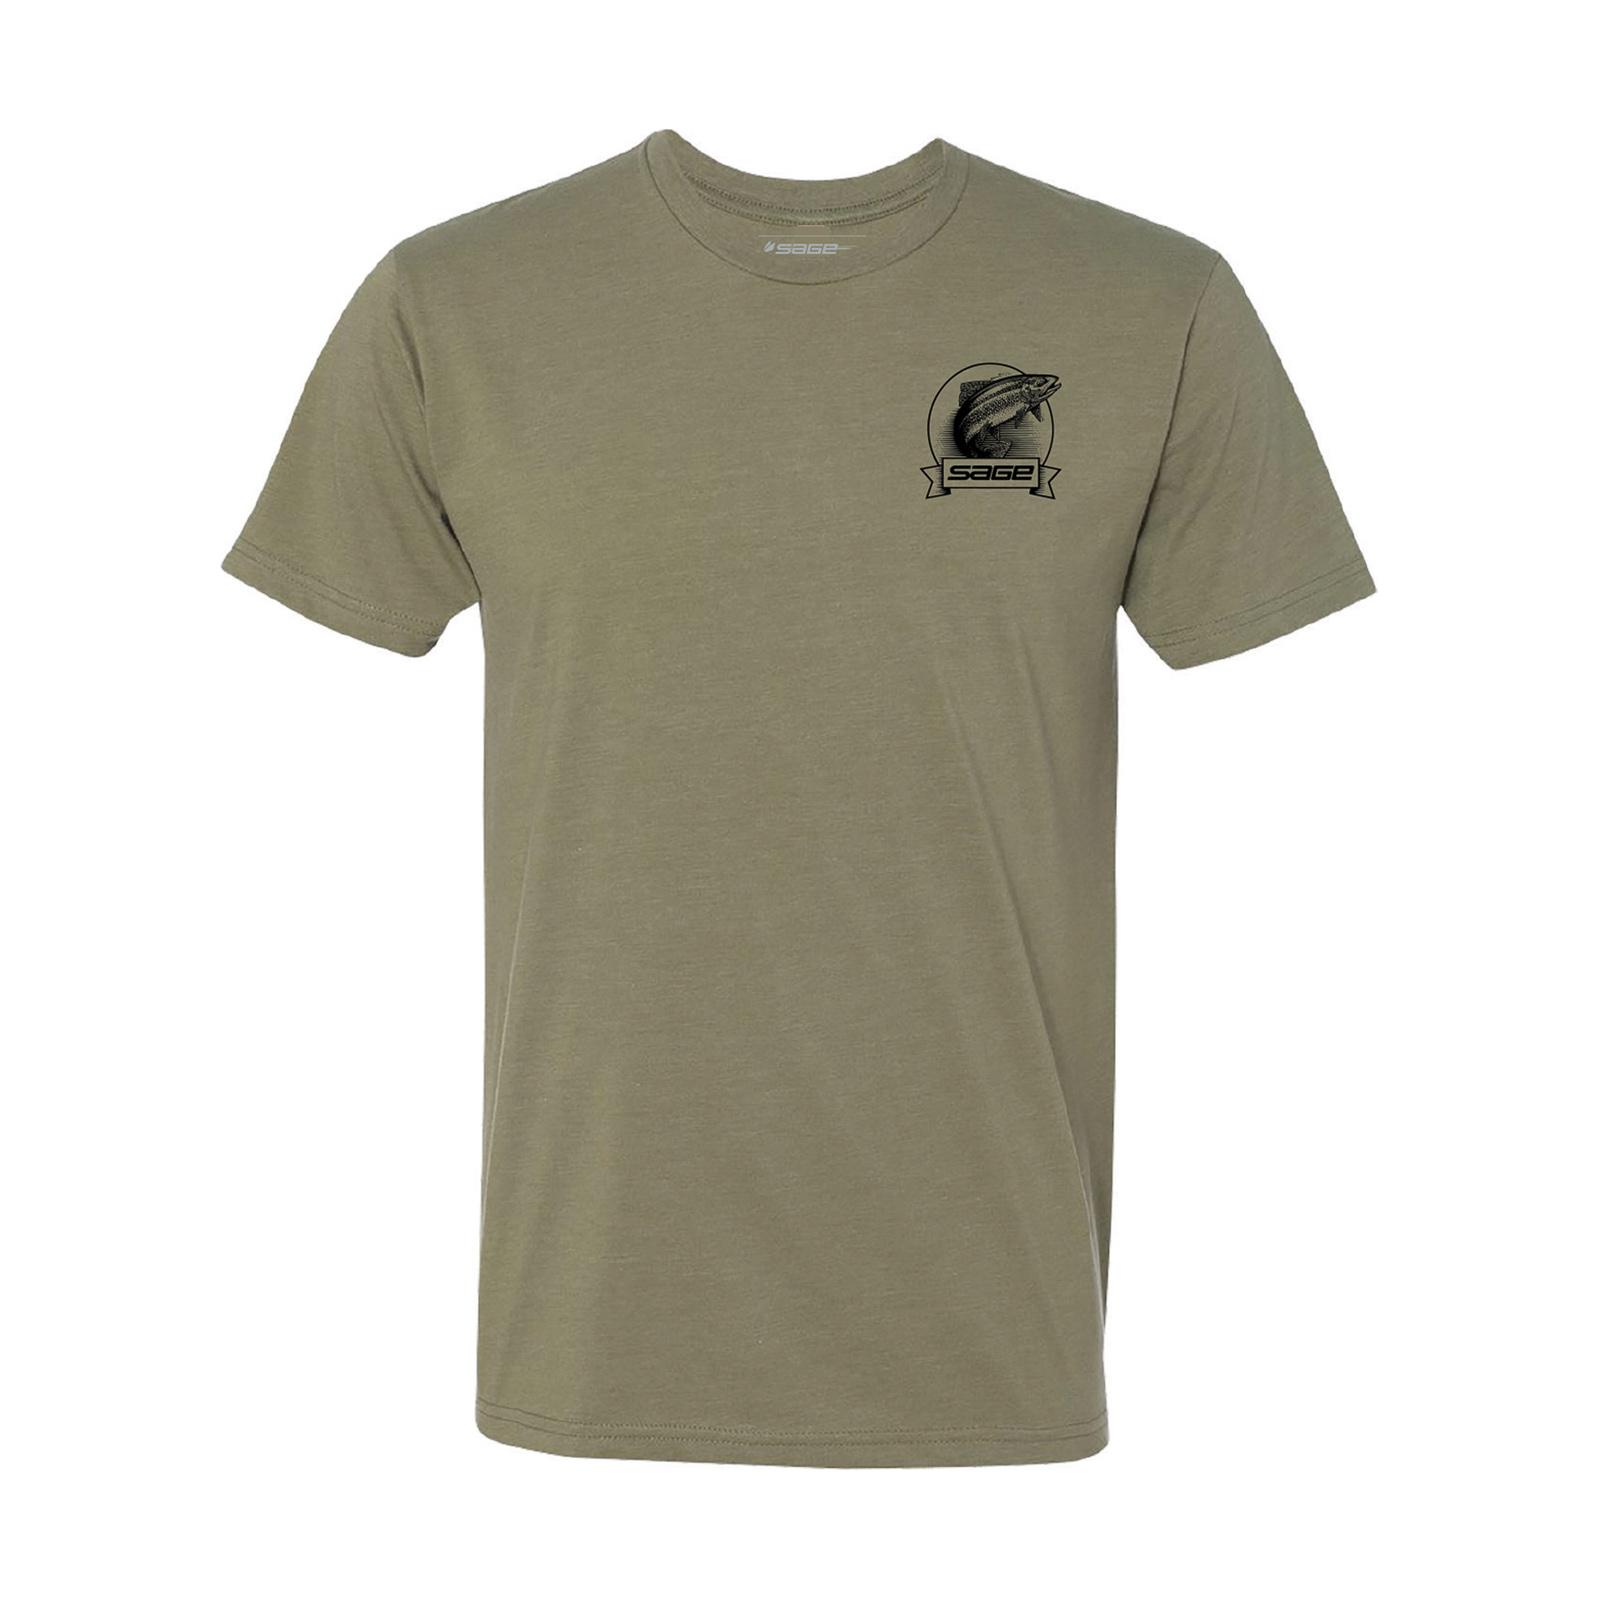 Sage Heritage Trout T-shirt